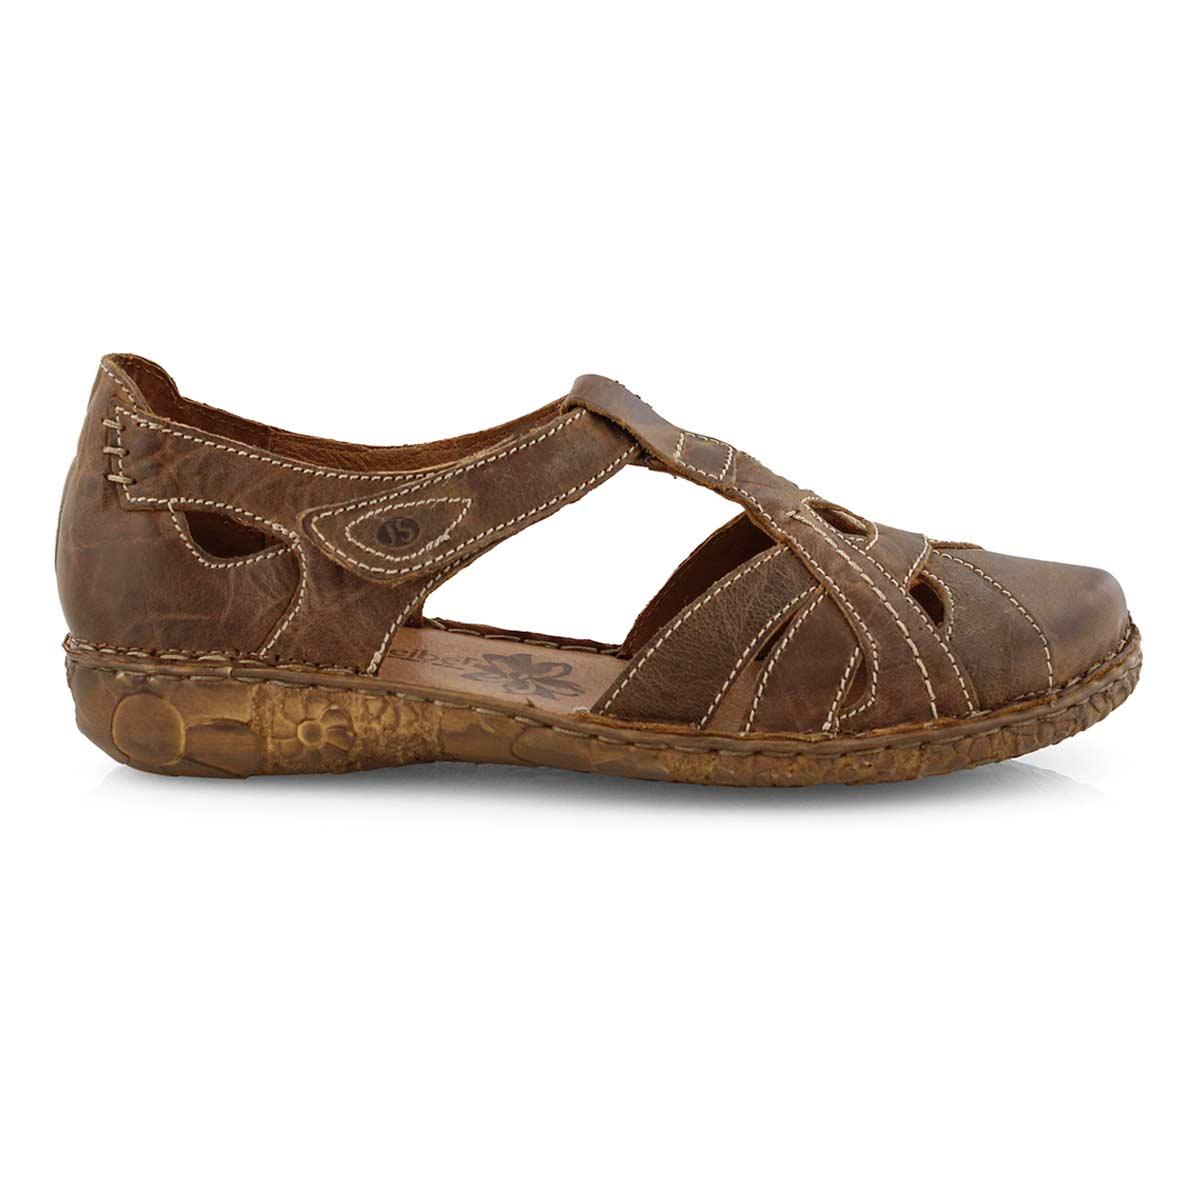 Lds Rosalie 29 brandy casual sandal